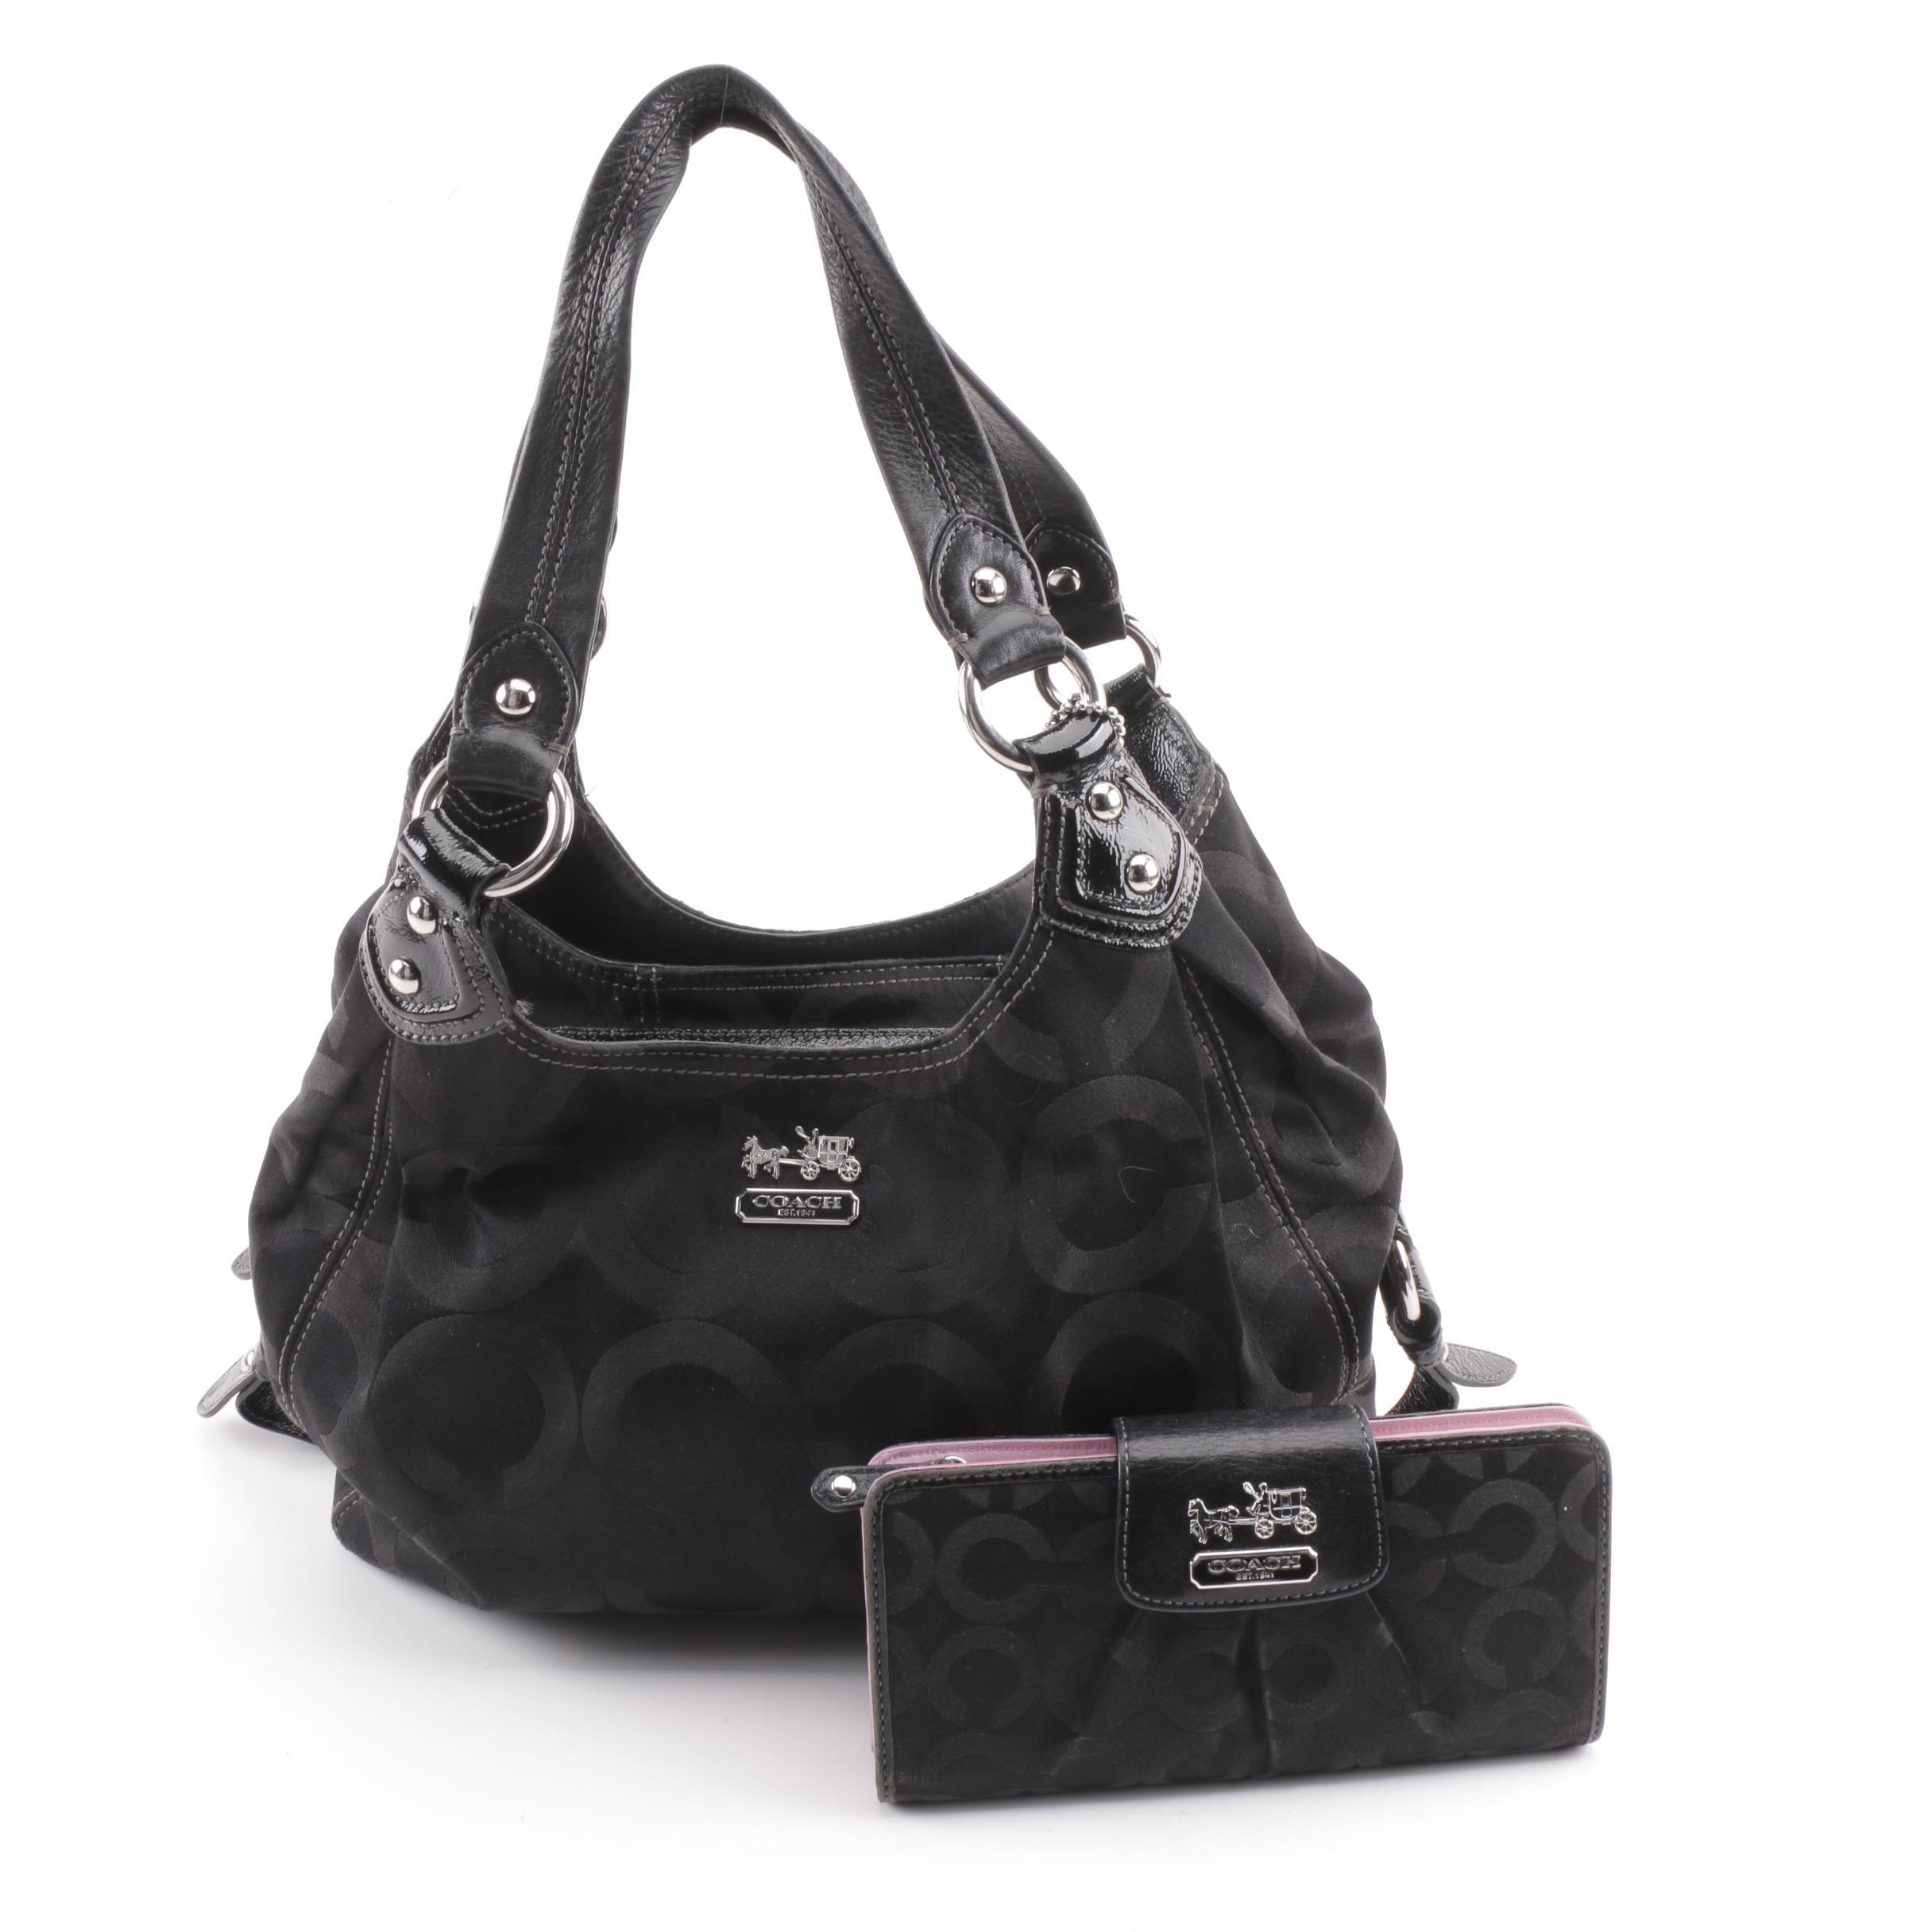 Coach Madison Op Art Maggie Black Shoulder Bag with Matching Wallet